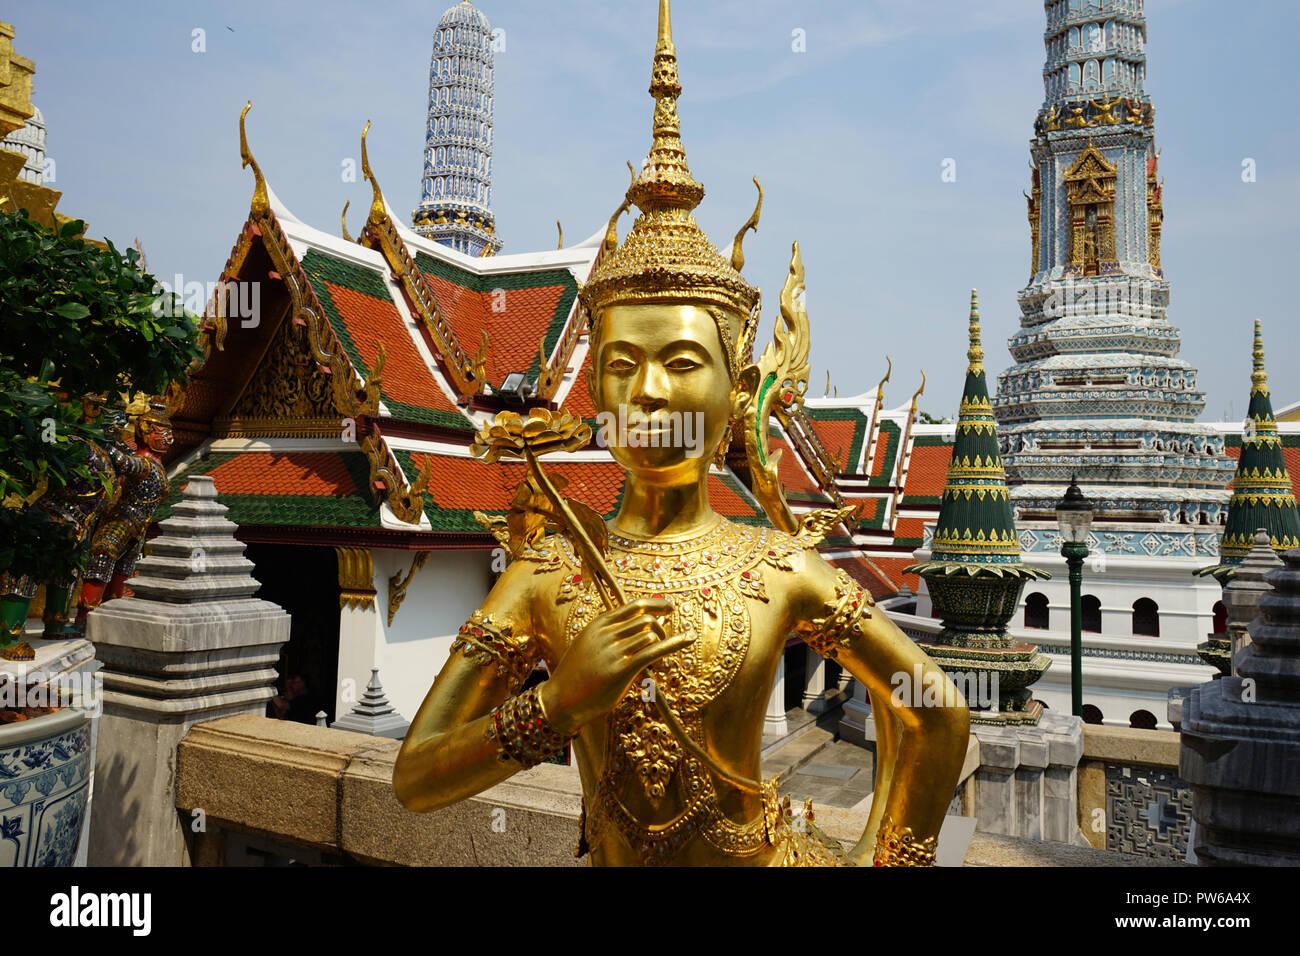 Kinnorn, Goldene Singhapanorn-Statue, Wat Phra Kaeo, Ko Ratanakosin, Bangkok, Thailand, Asien - Stock Image